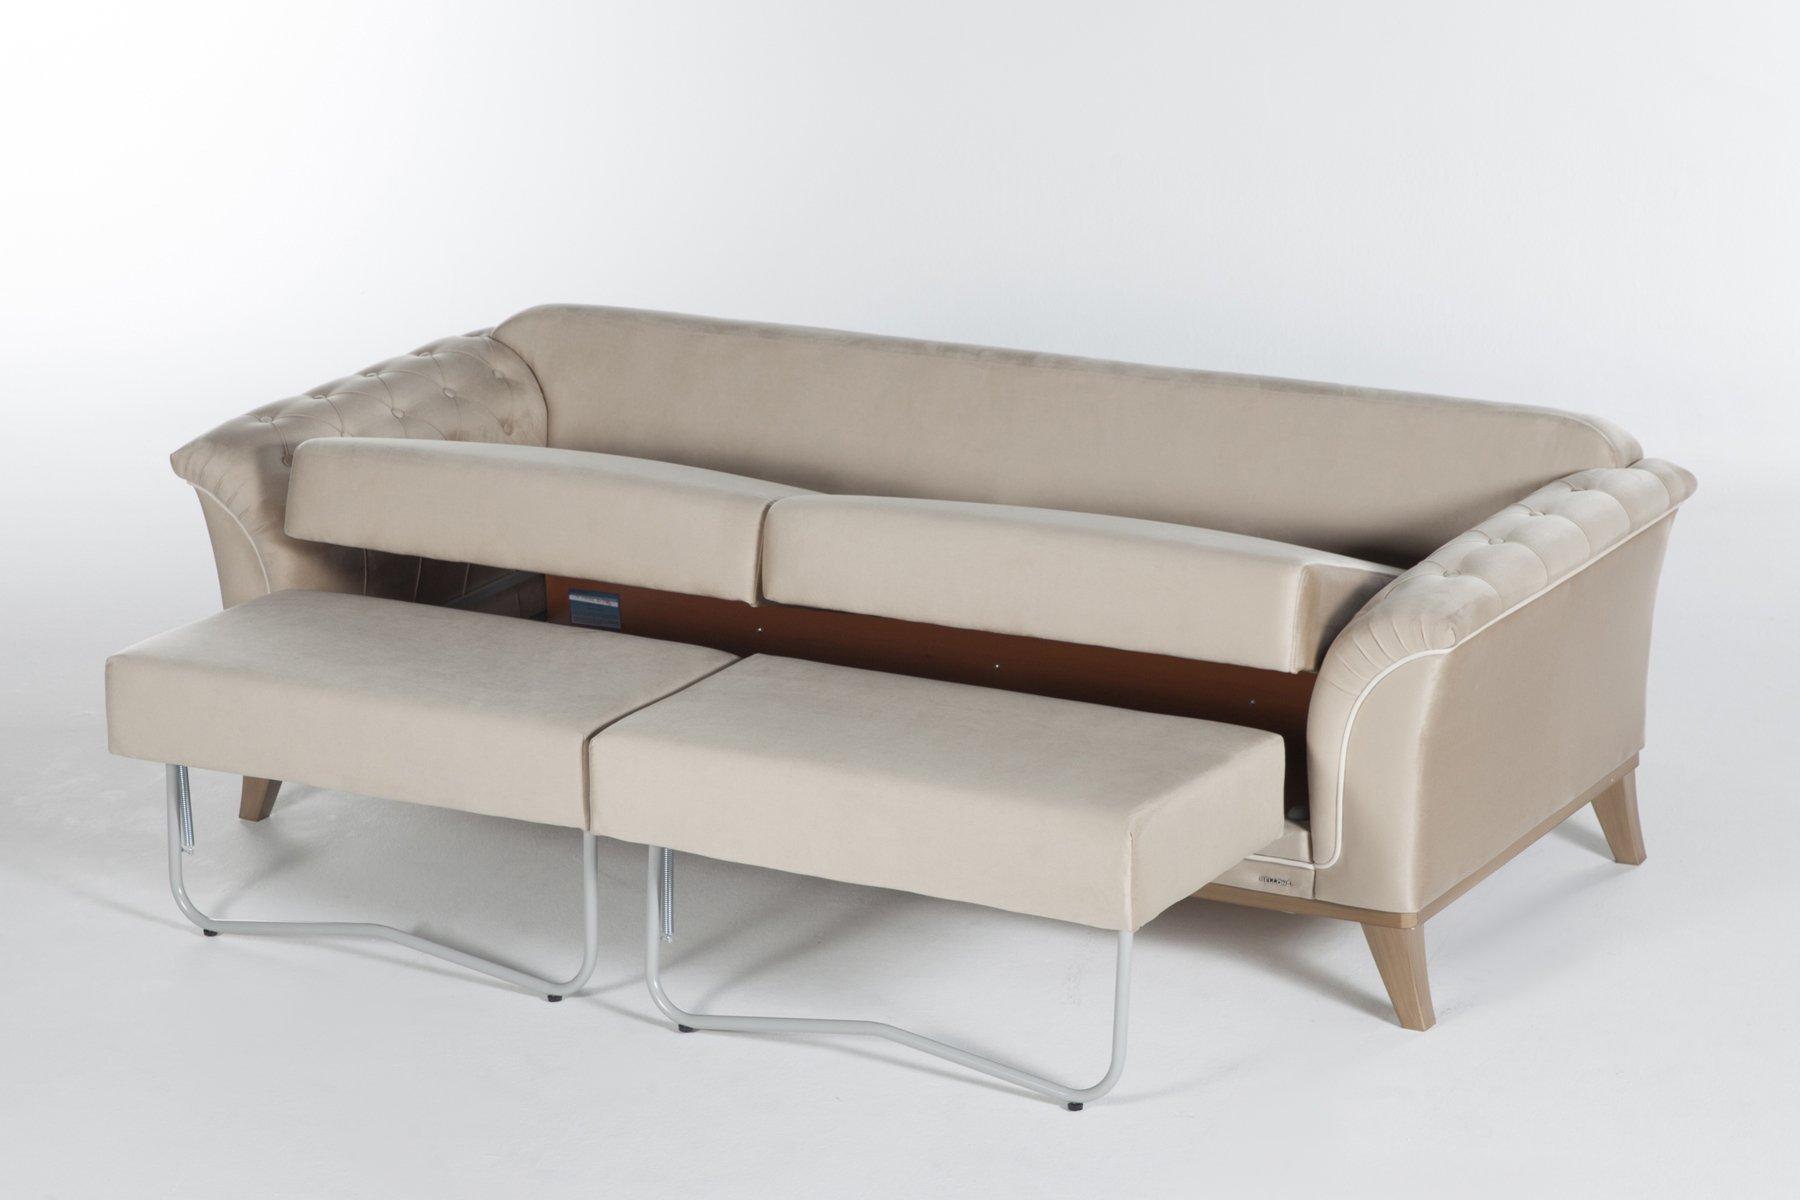 Dekora Zero Vizon Convertible Sofa Bed by Sunset